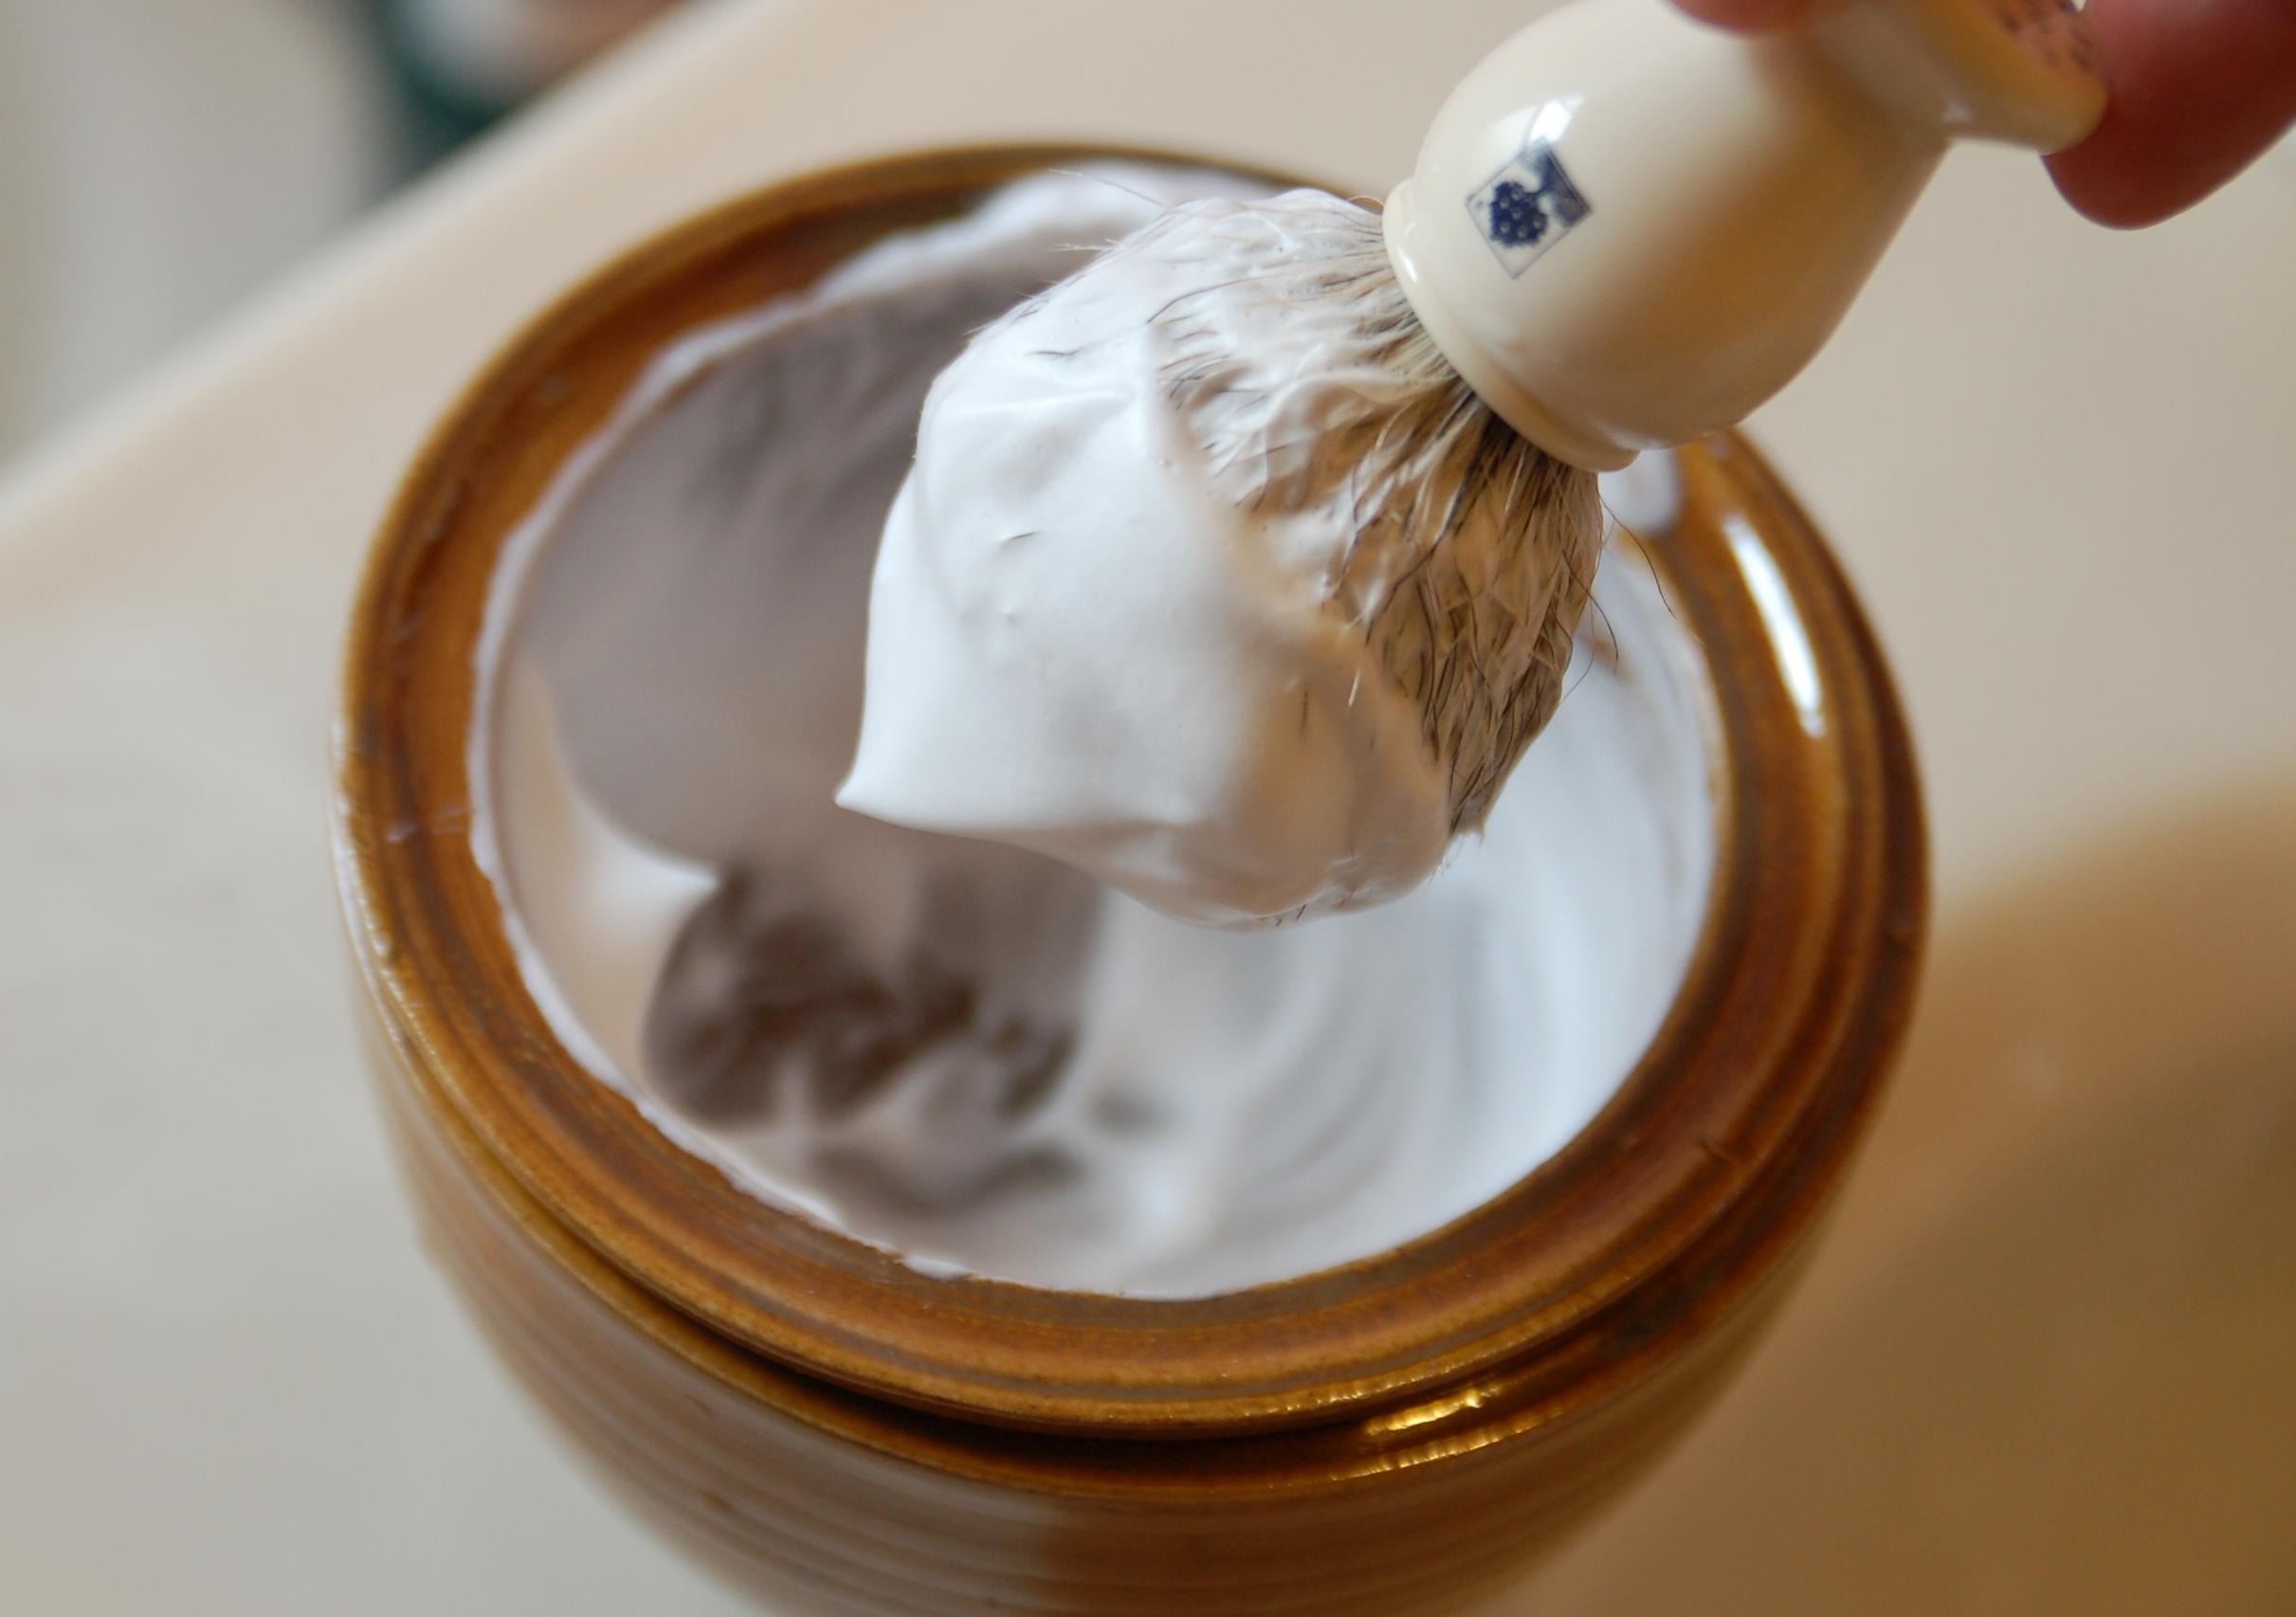 hair removal cream.jpg